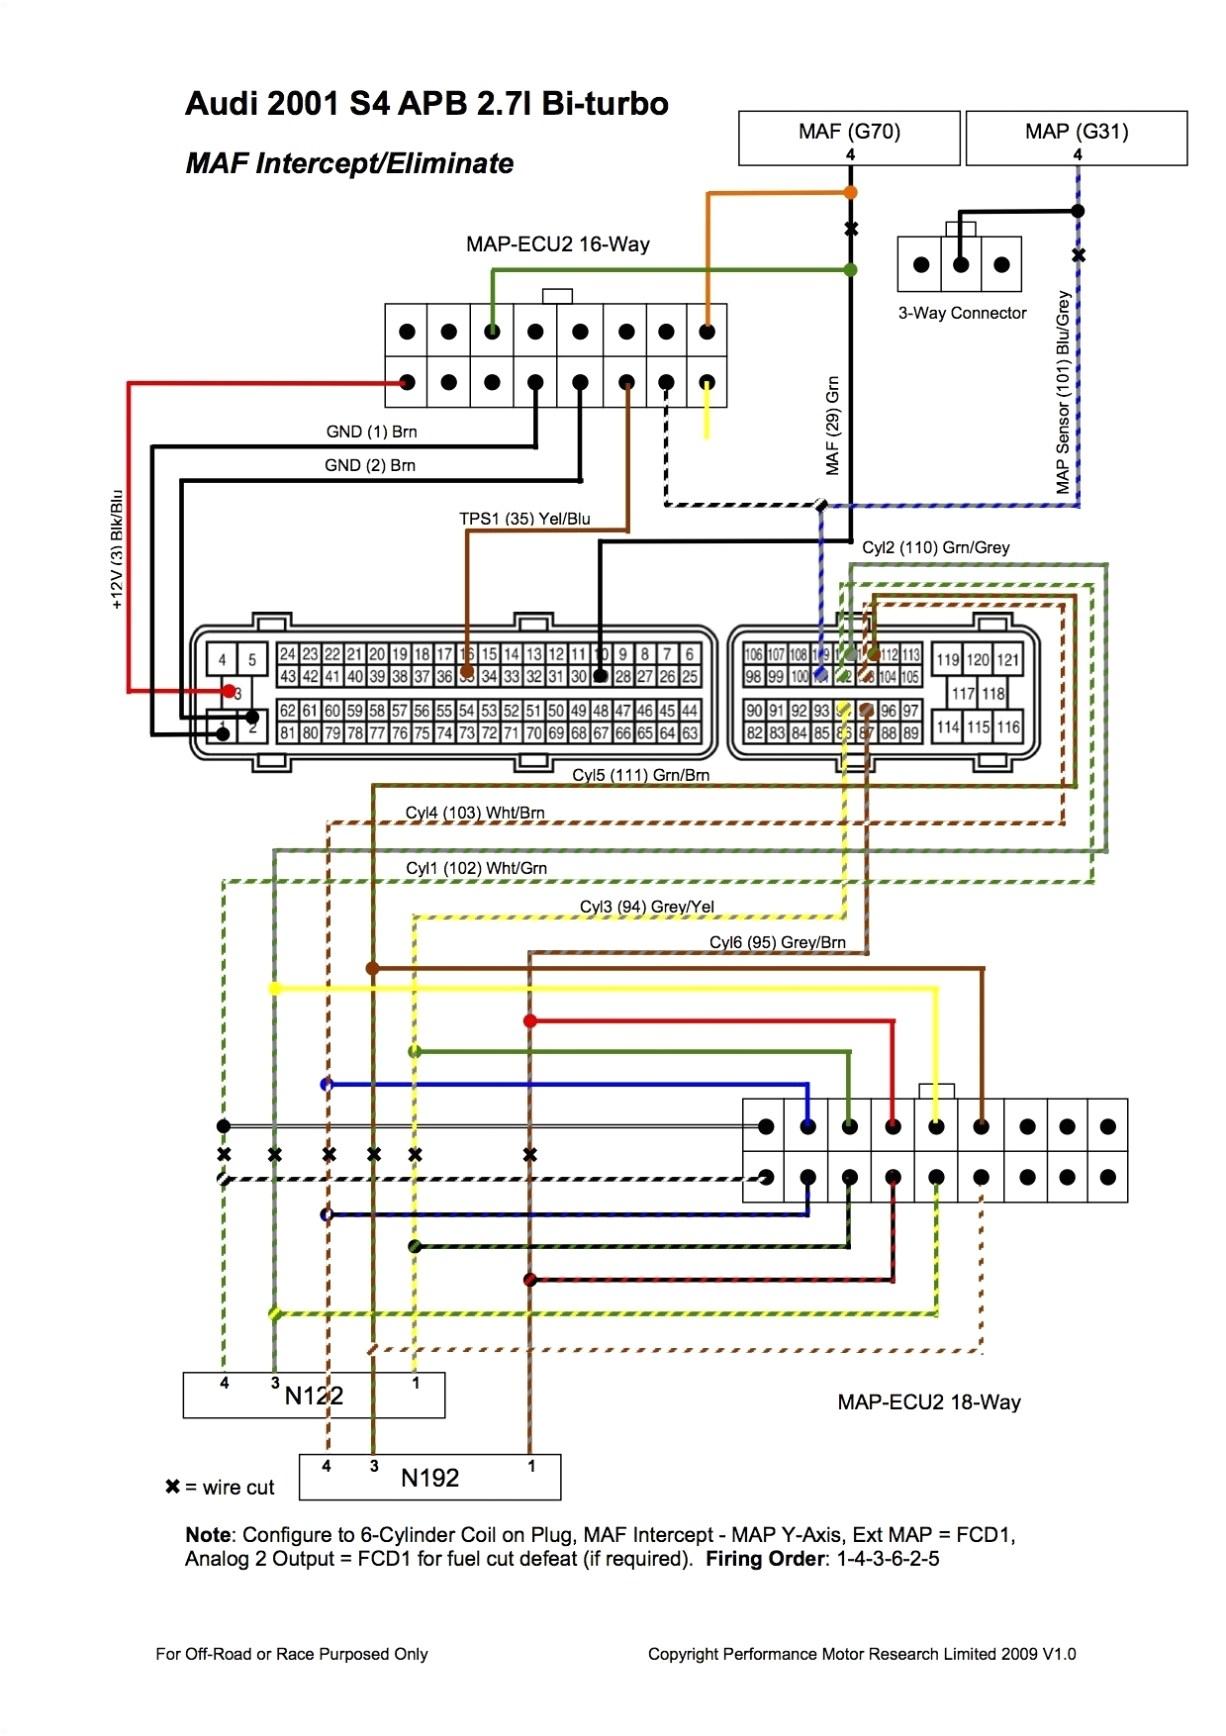 wiring diagram for 1996 volkswagen golf get free image about wiring mitsubishi fuso electrical diagram